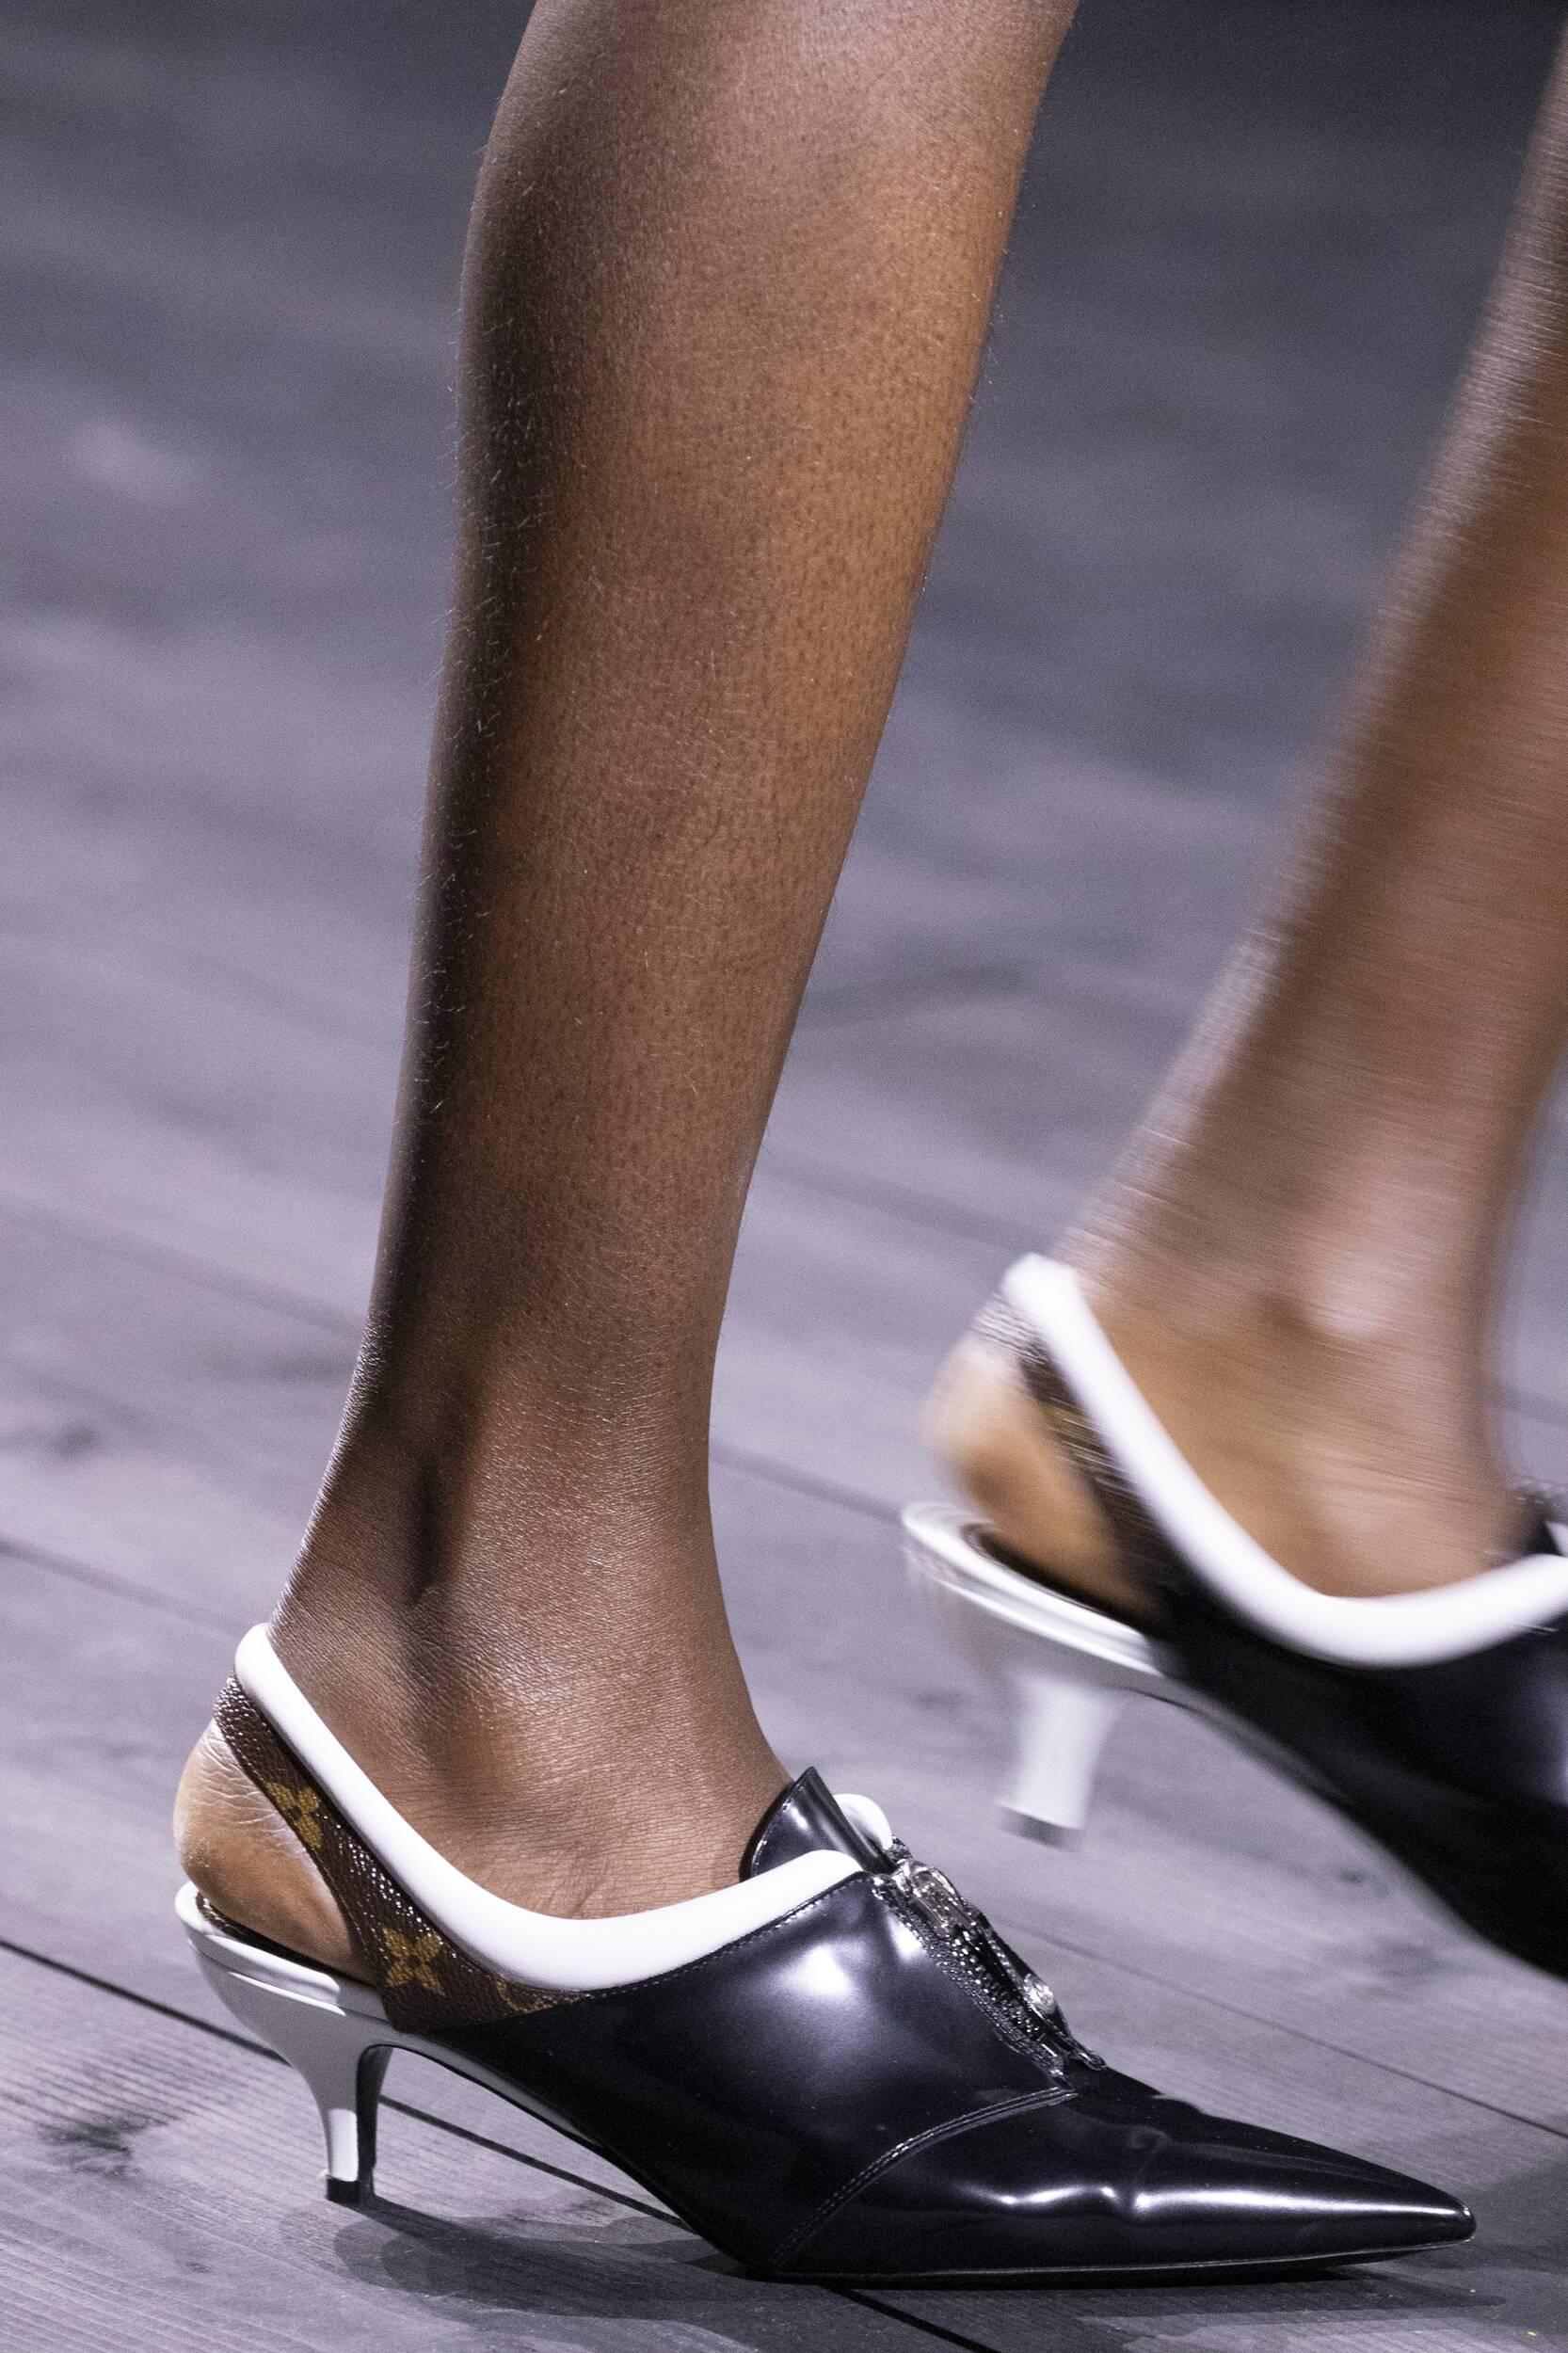 Shoes Detail Fall Winter 2020 Louis Vuitton